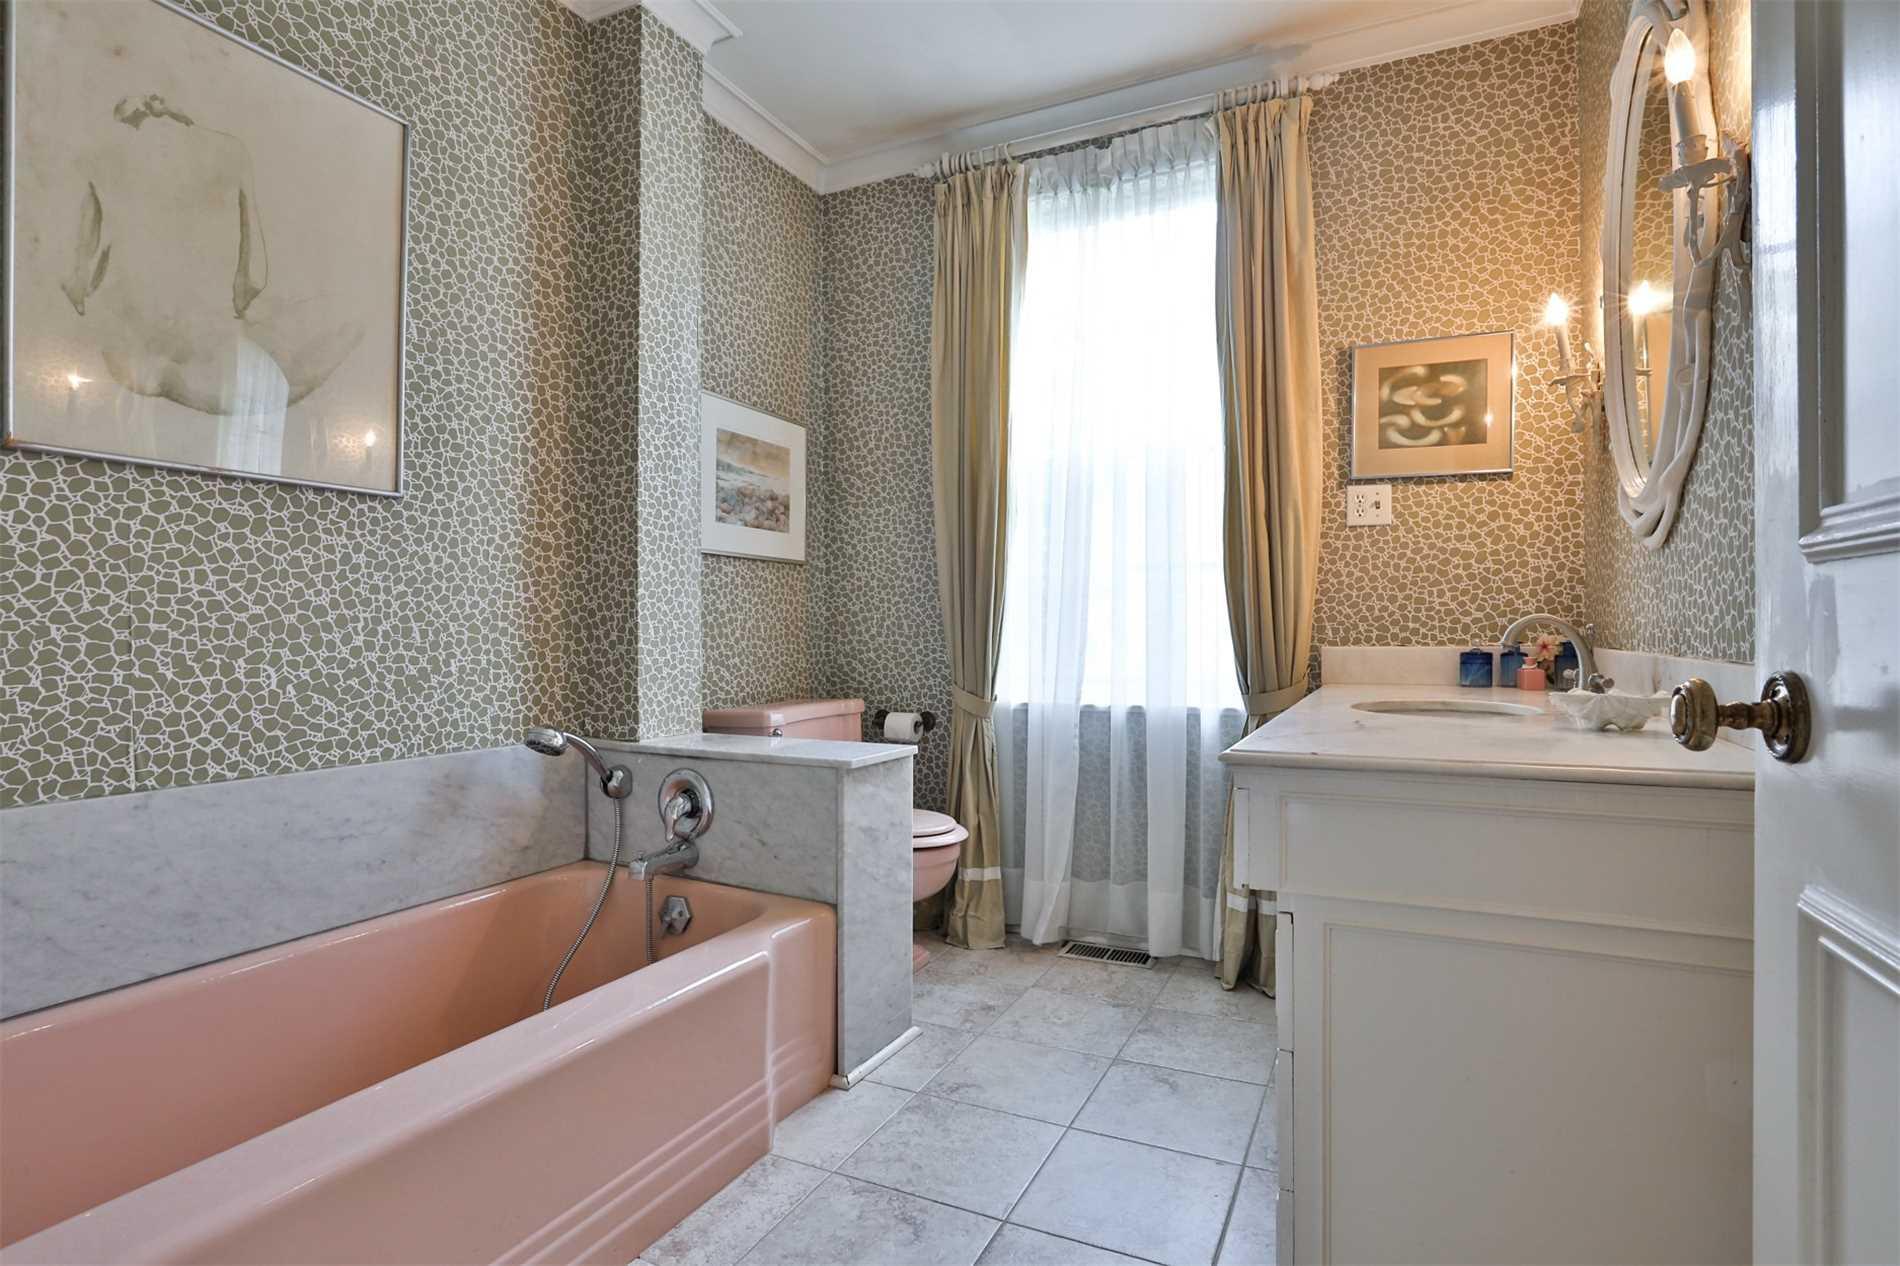 Detached house For Sale In Toronto - 40 Glen Edyth Pl, Toronto, Ontario, Canada M4V 2W2 , 5 Bedrooms Bedrooms, ,5 BathroomsBathrooms,Detached,For Sale,Glen Edyth